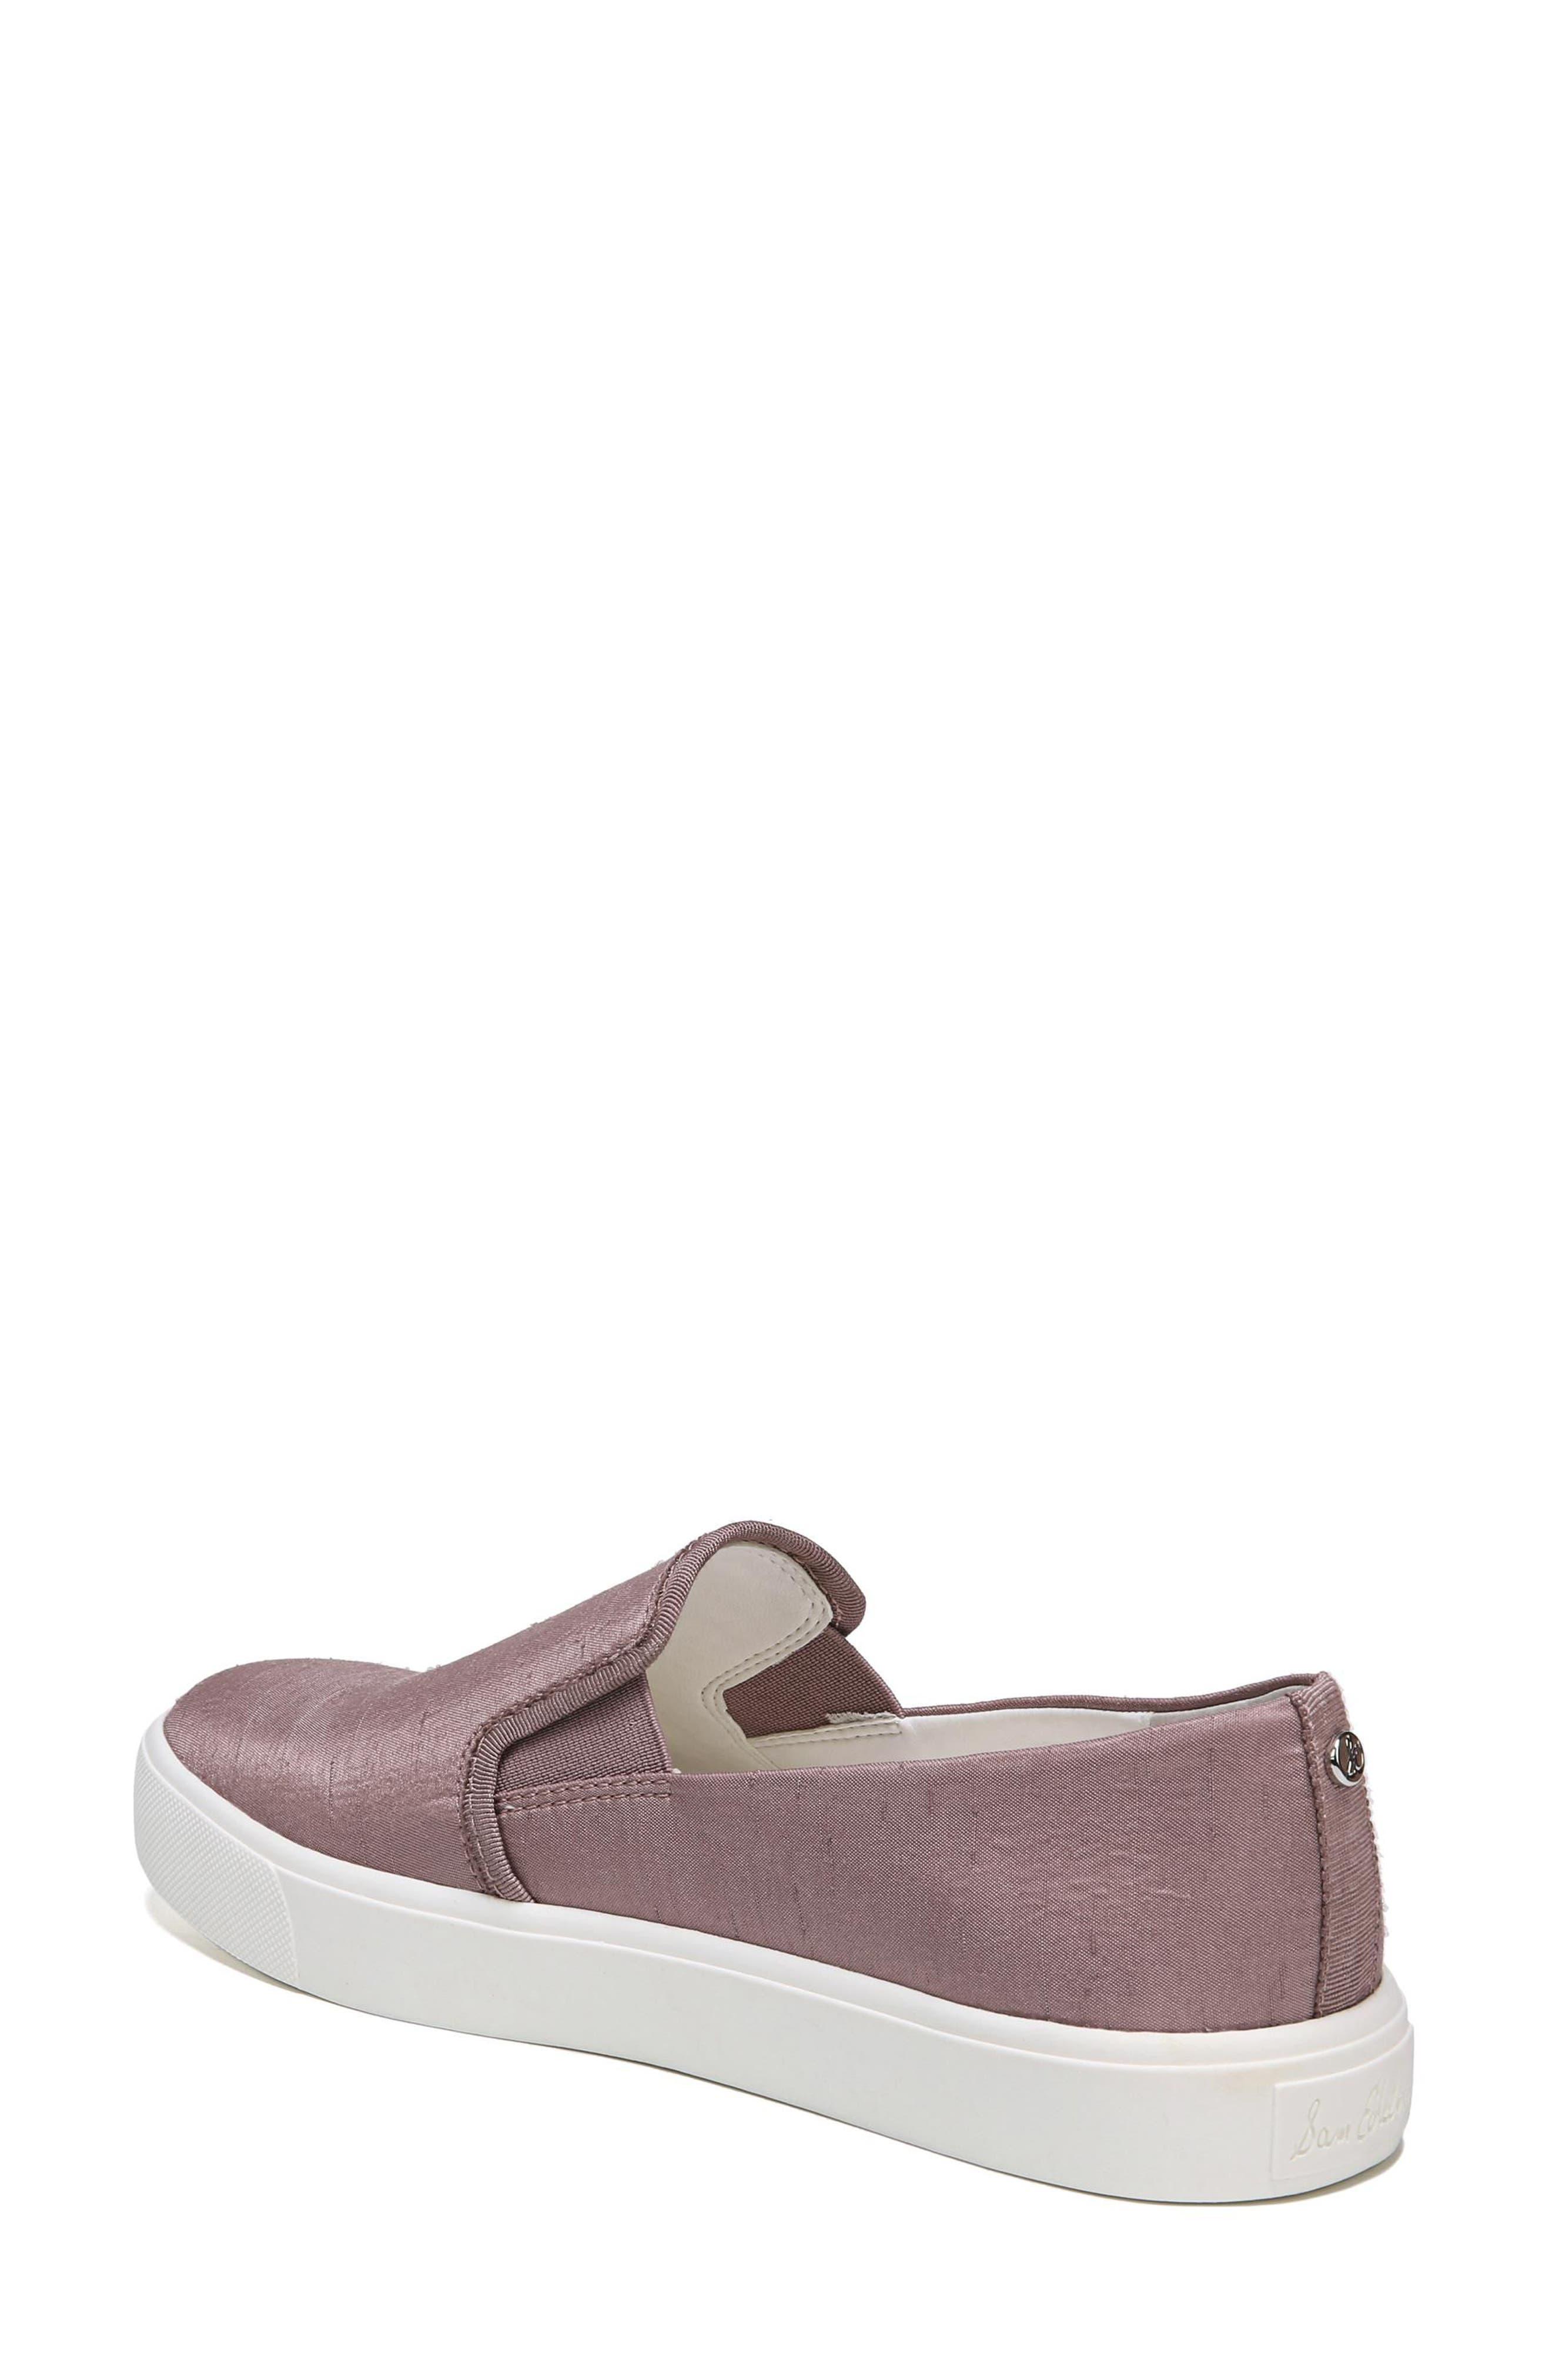 Elton Slip-On Sneaker,                             Alternate thumbnail 2, color,                             Pink Mauve Silk Fabric